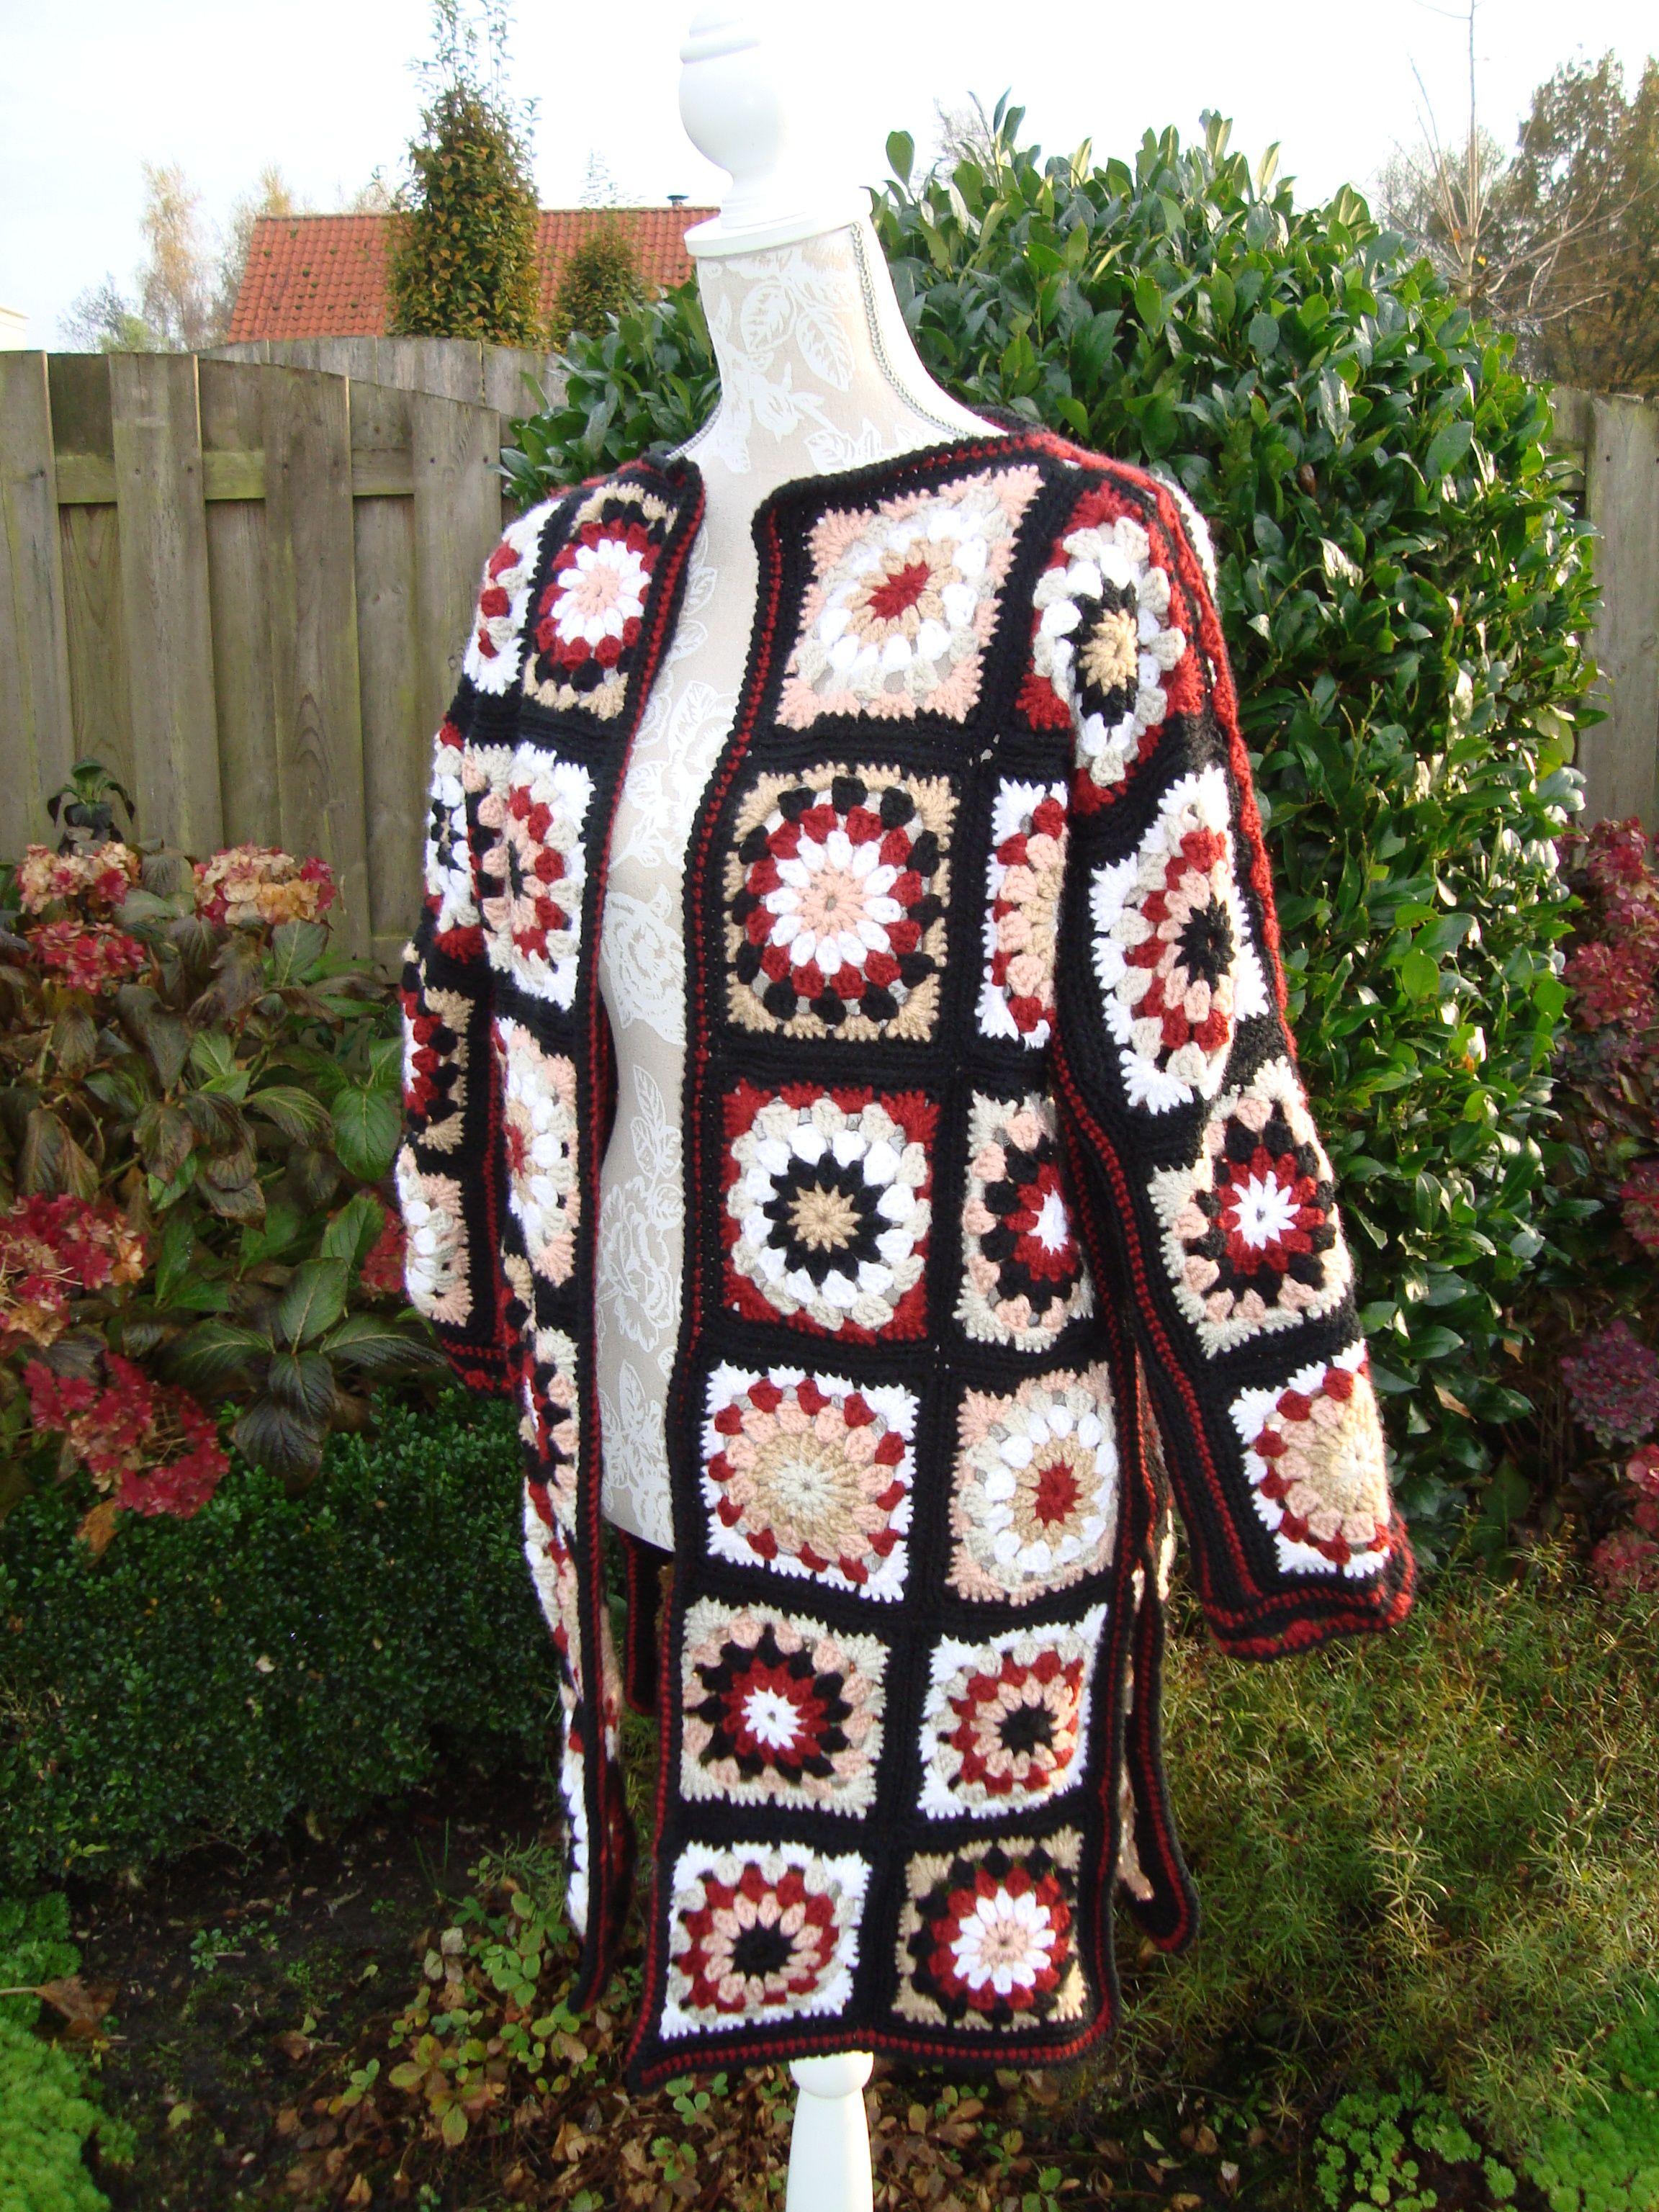 Colourful Long Cardigan Crochet Pattern Coatigan In Grannies By